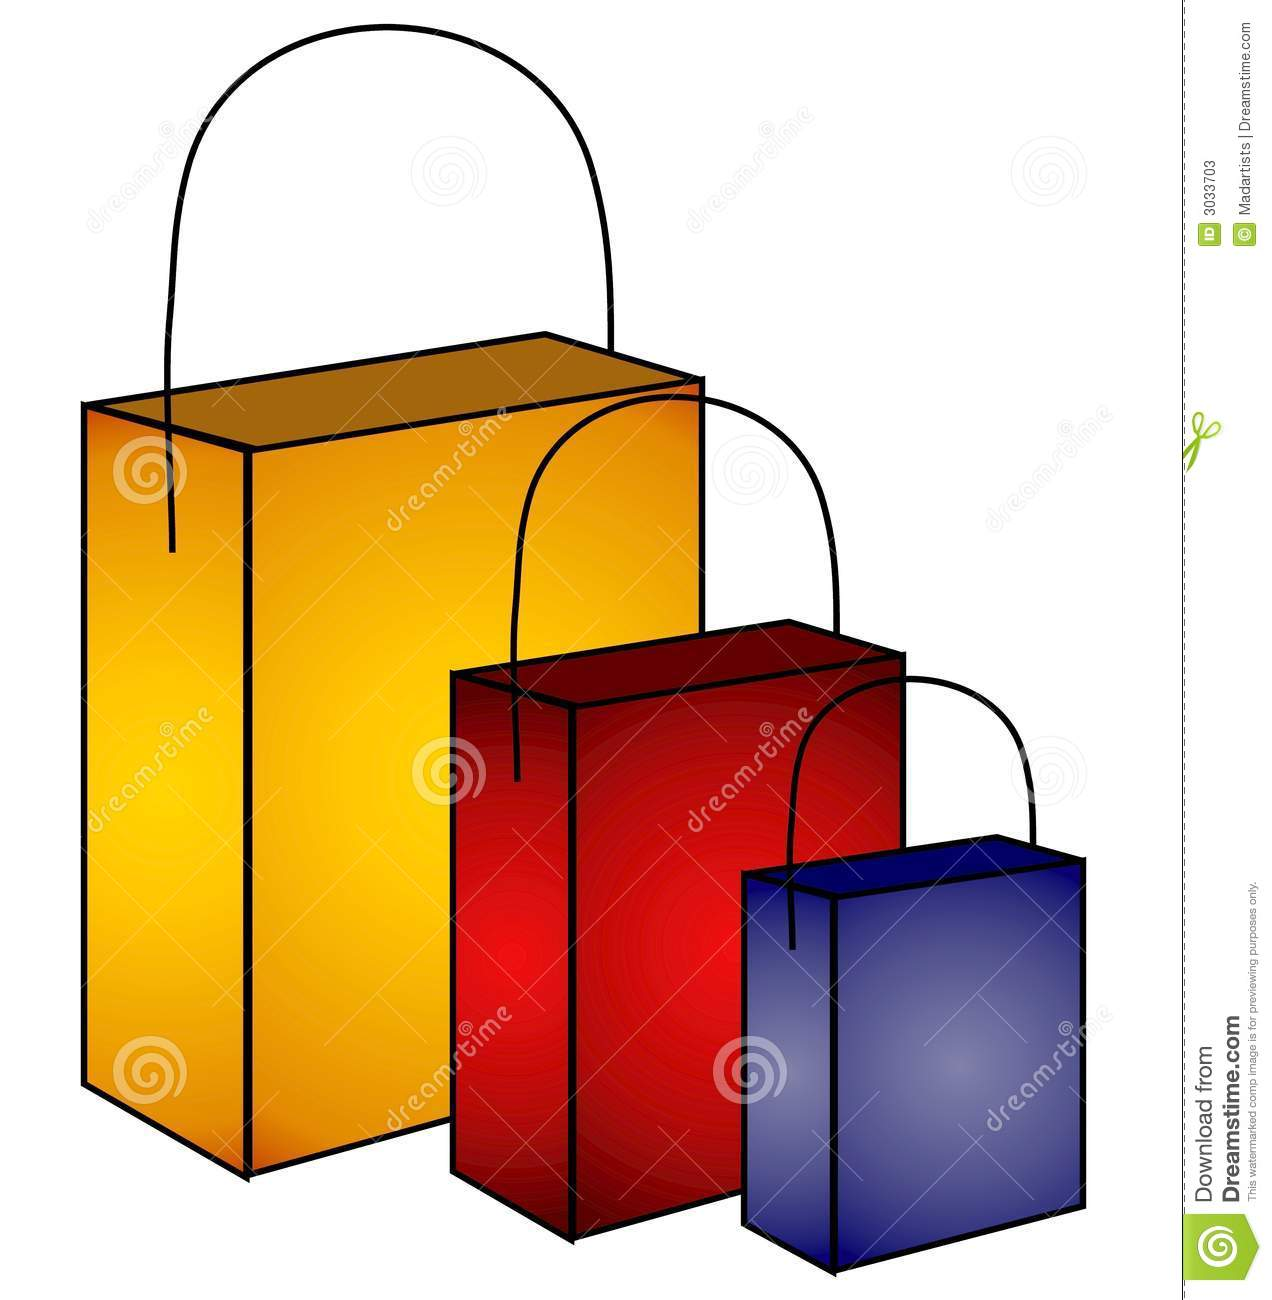 Bag clipart. Shopping panda free images